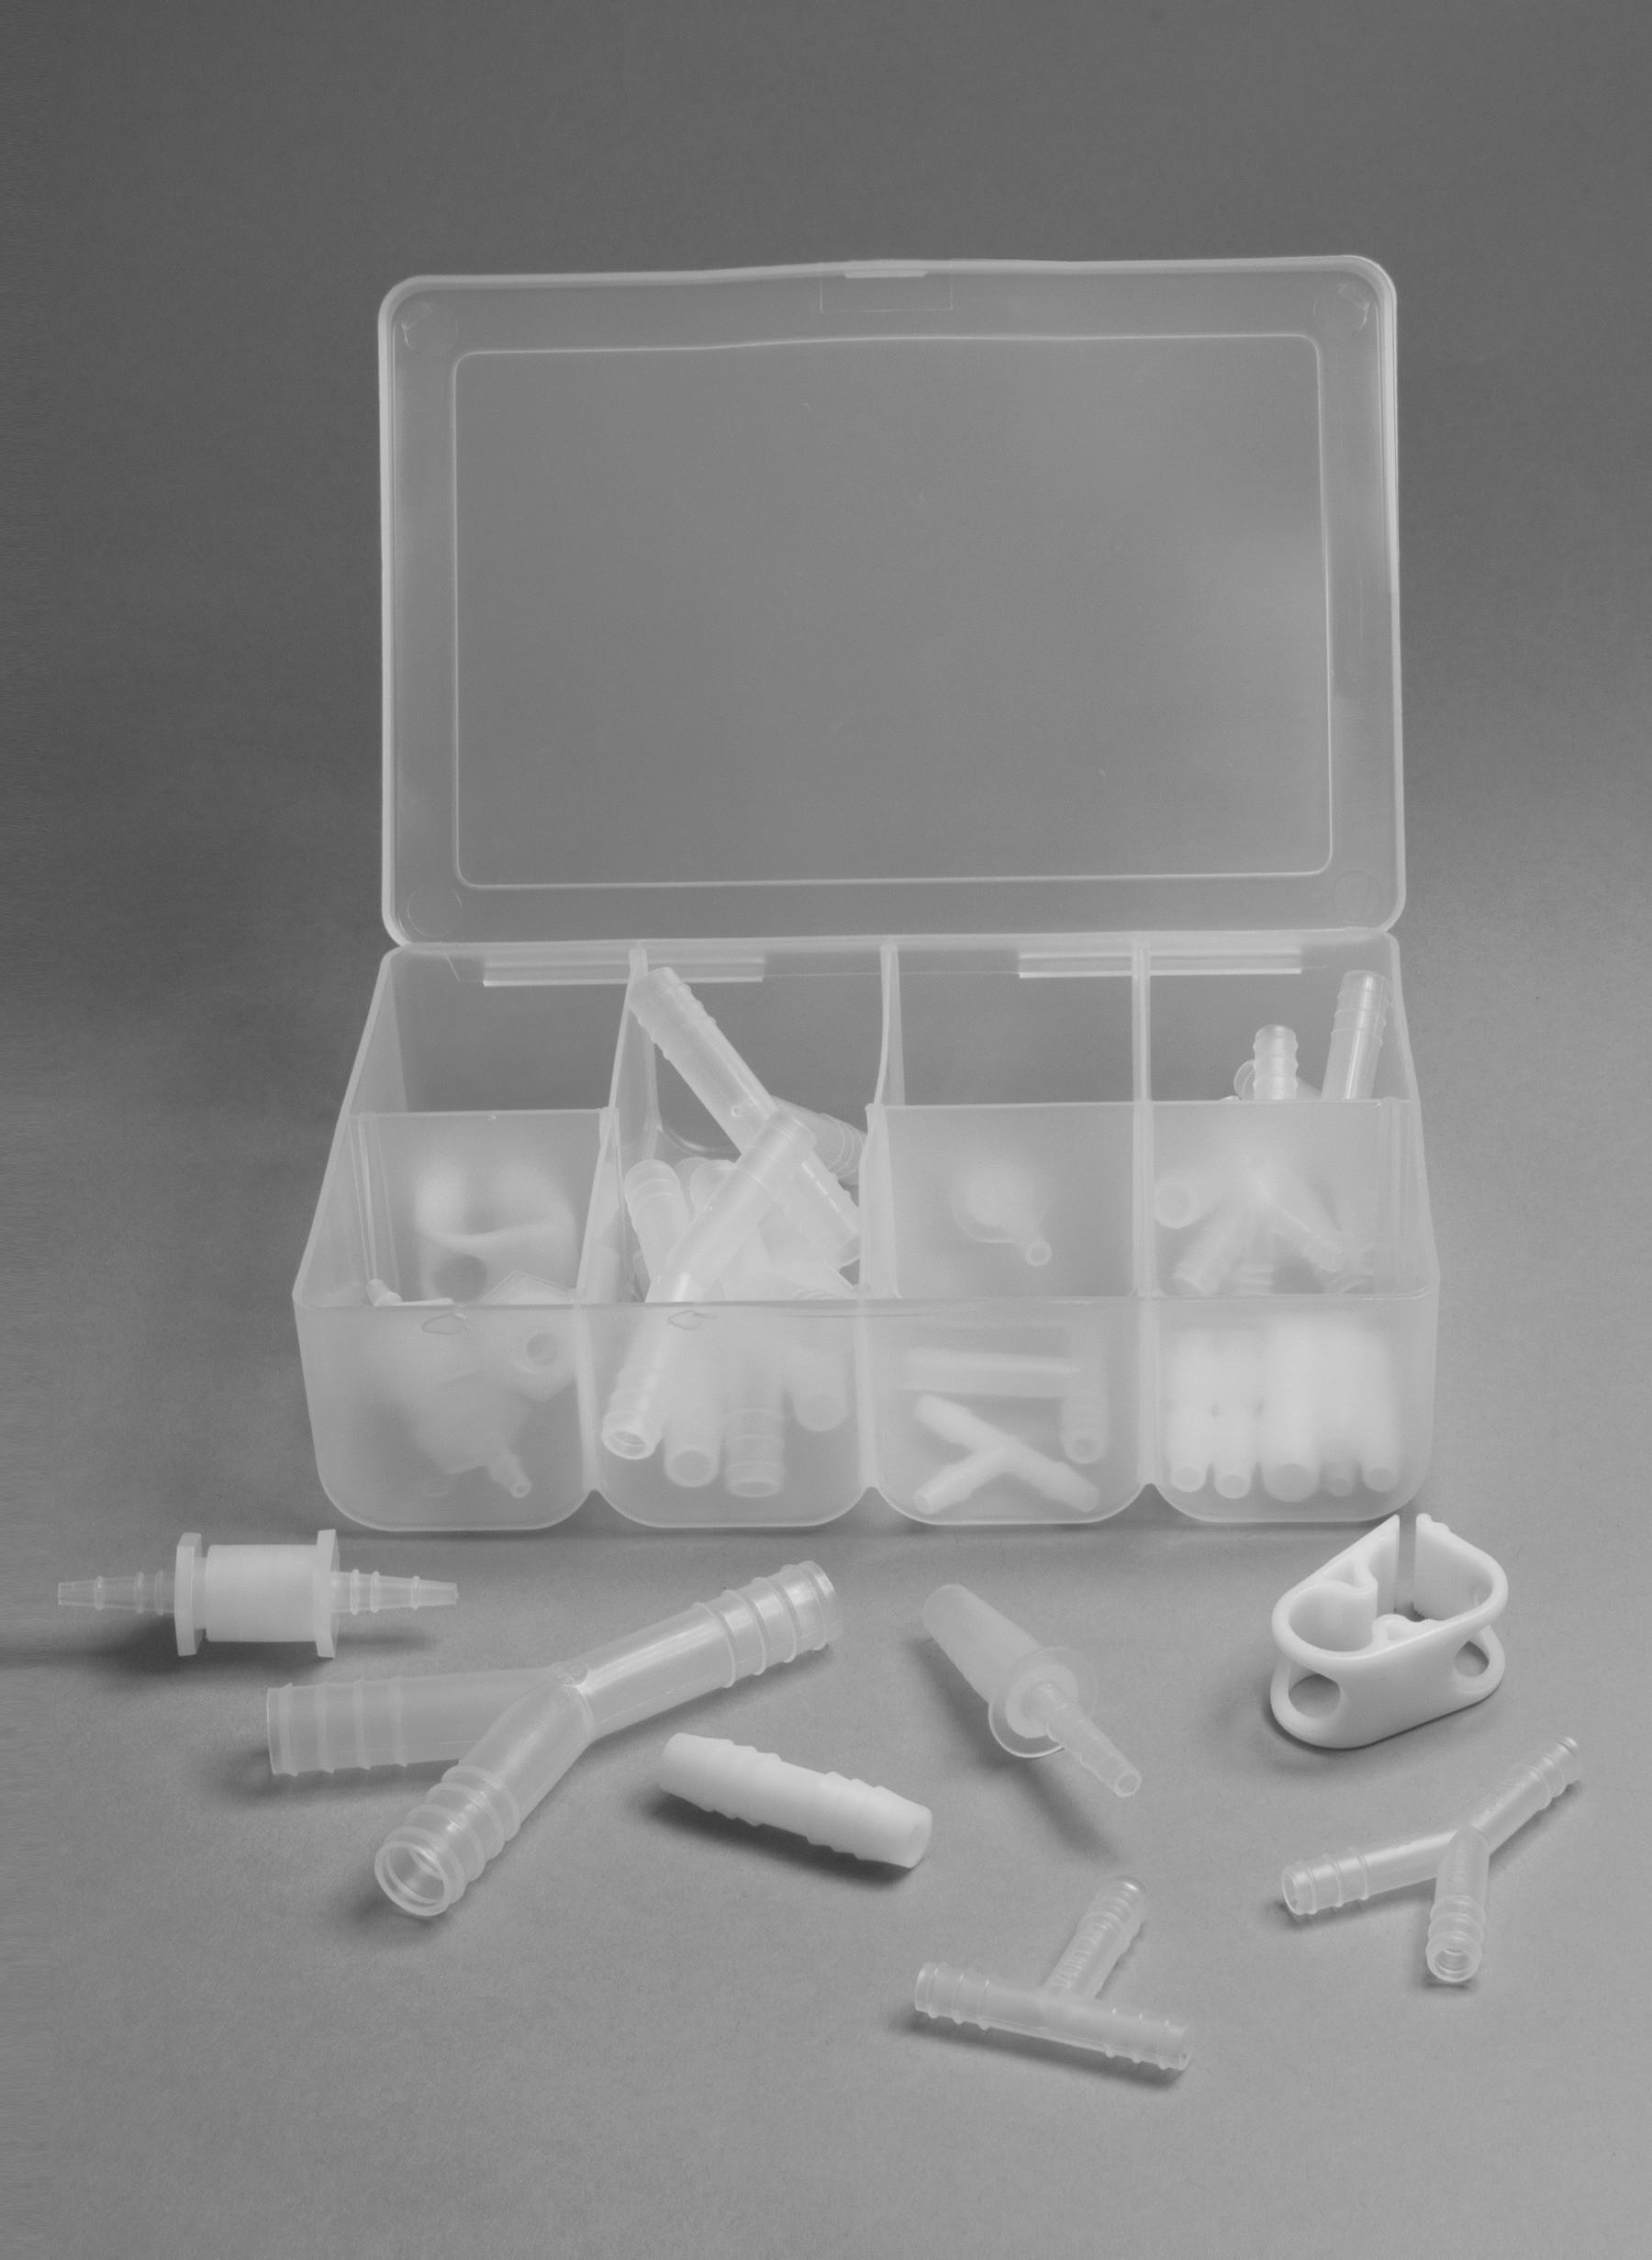 28-Piece Fitting Kit